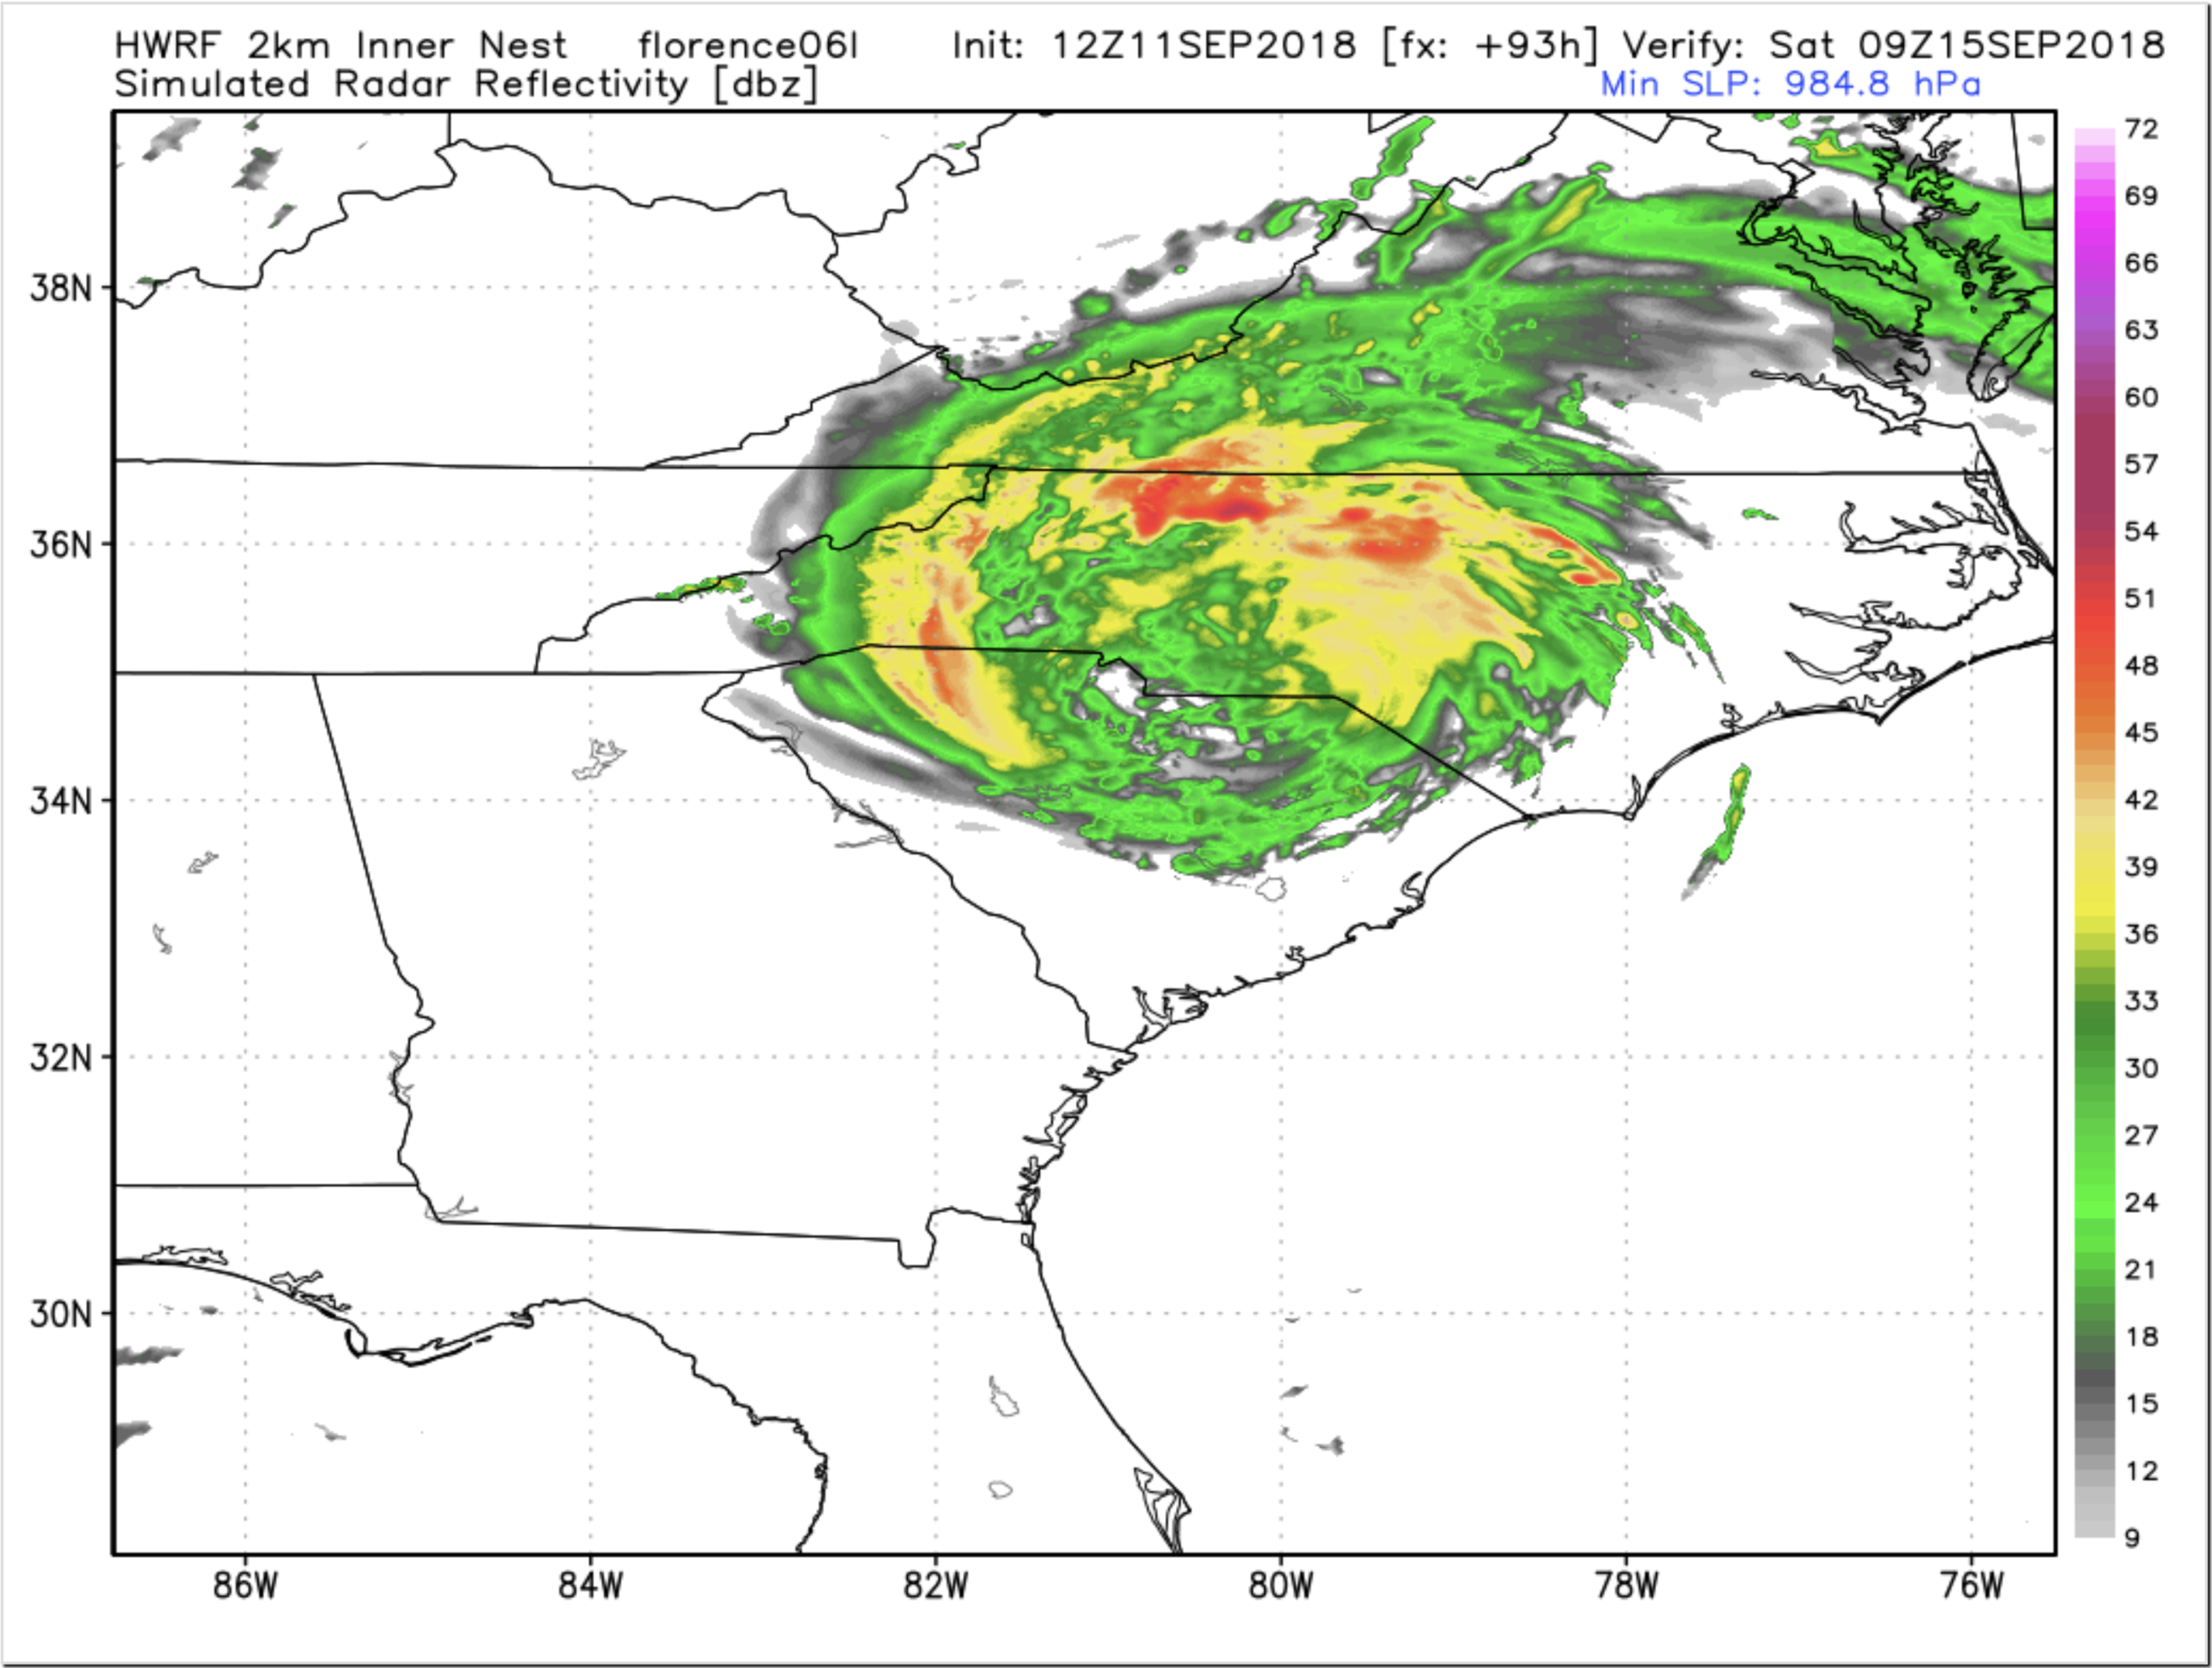 12z HWRF Tuesday Simulated Radar For Saturday Morning